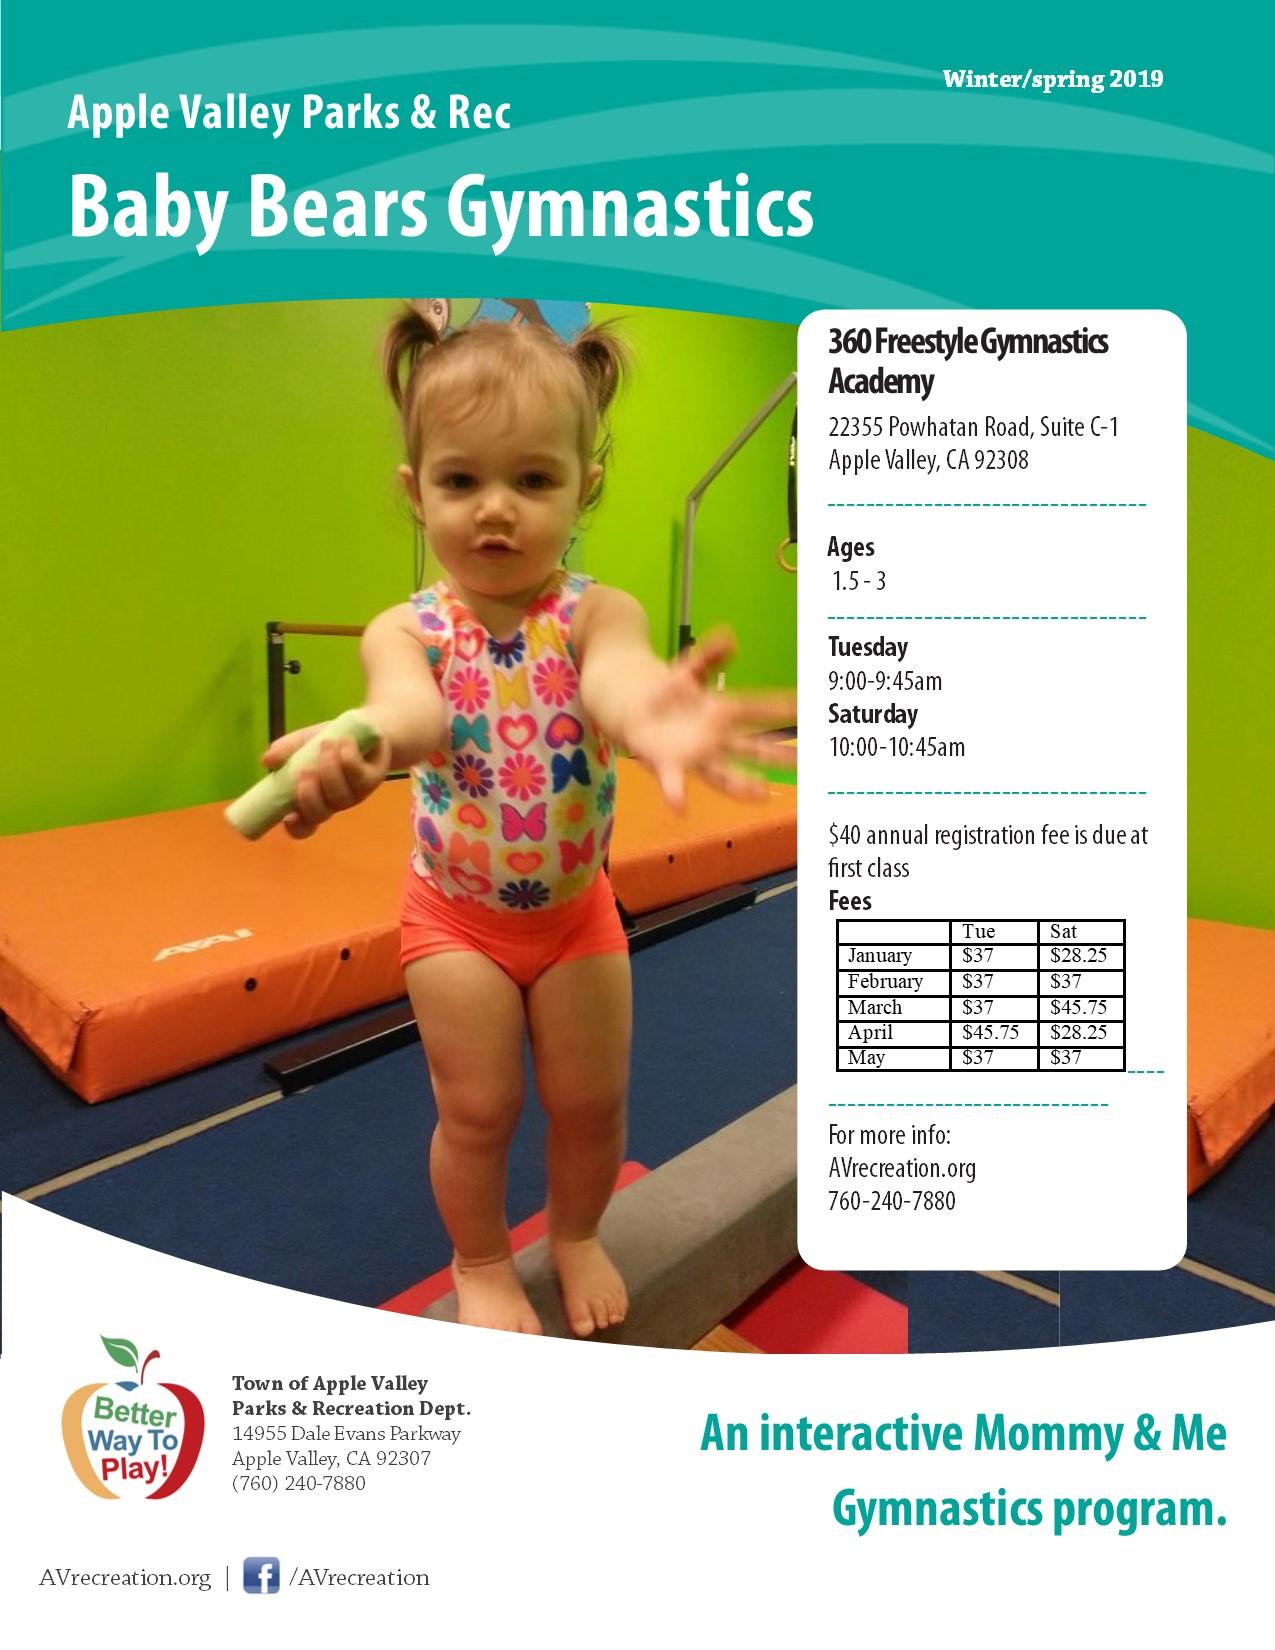 Baby Bears Gymnastics